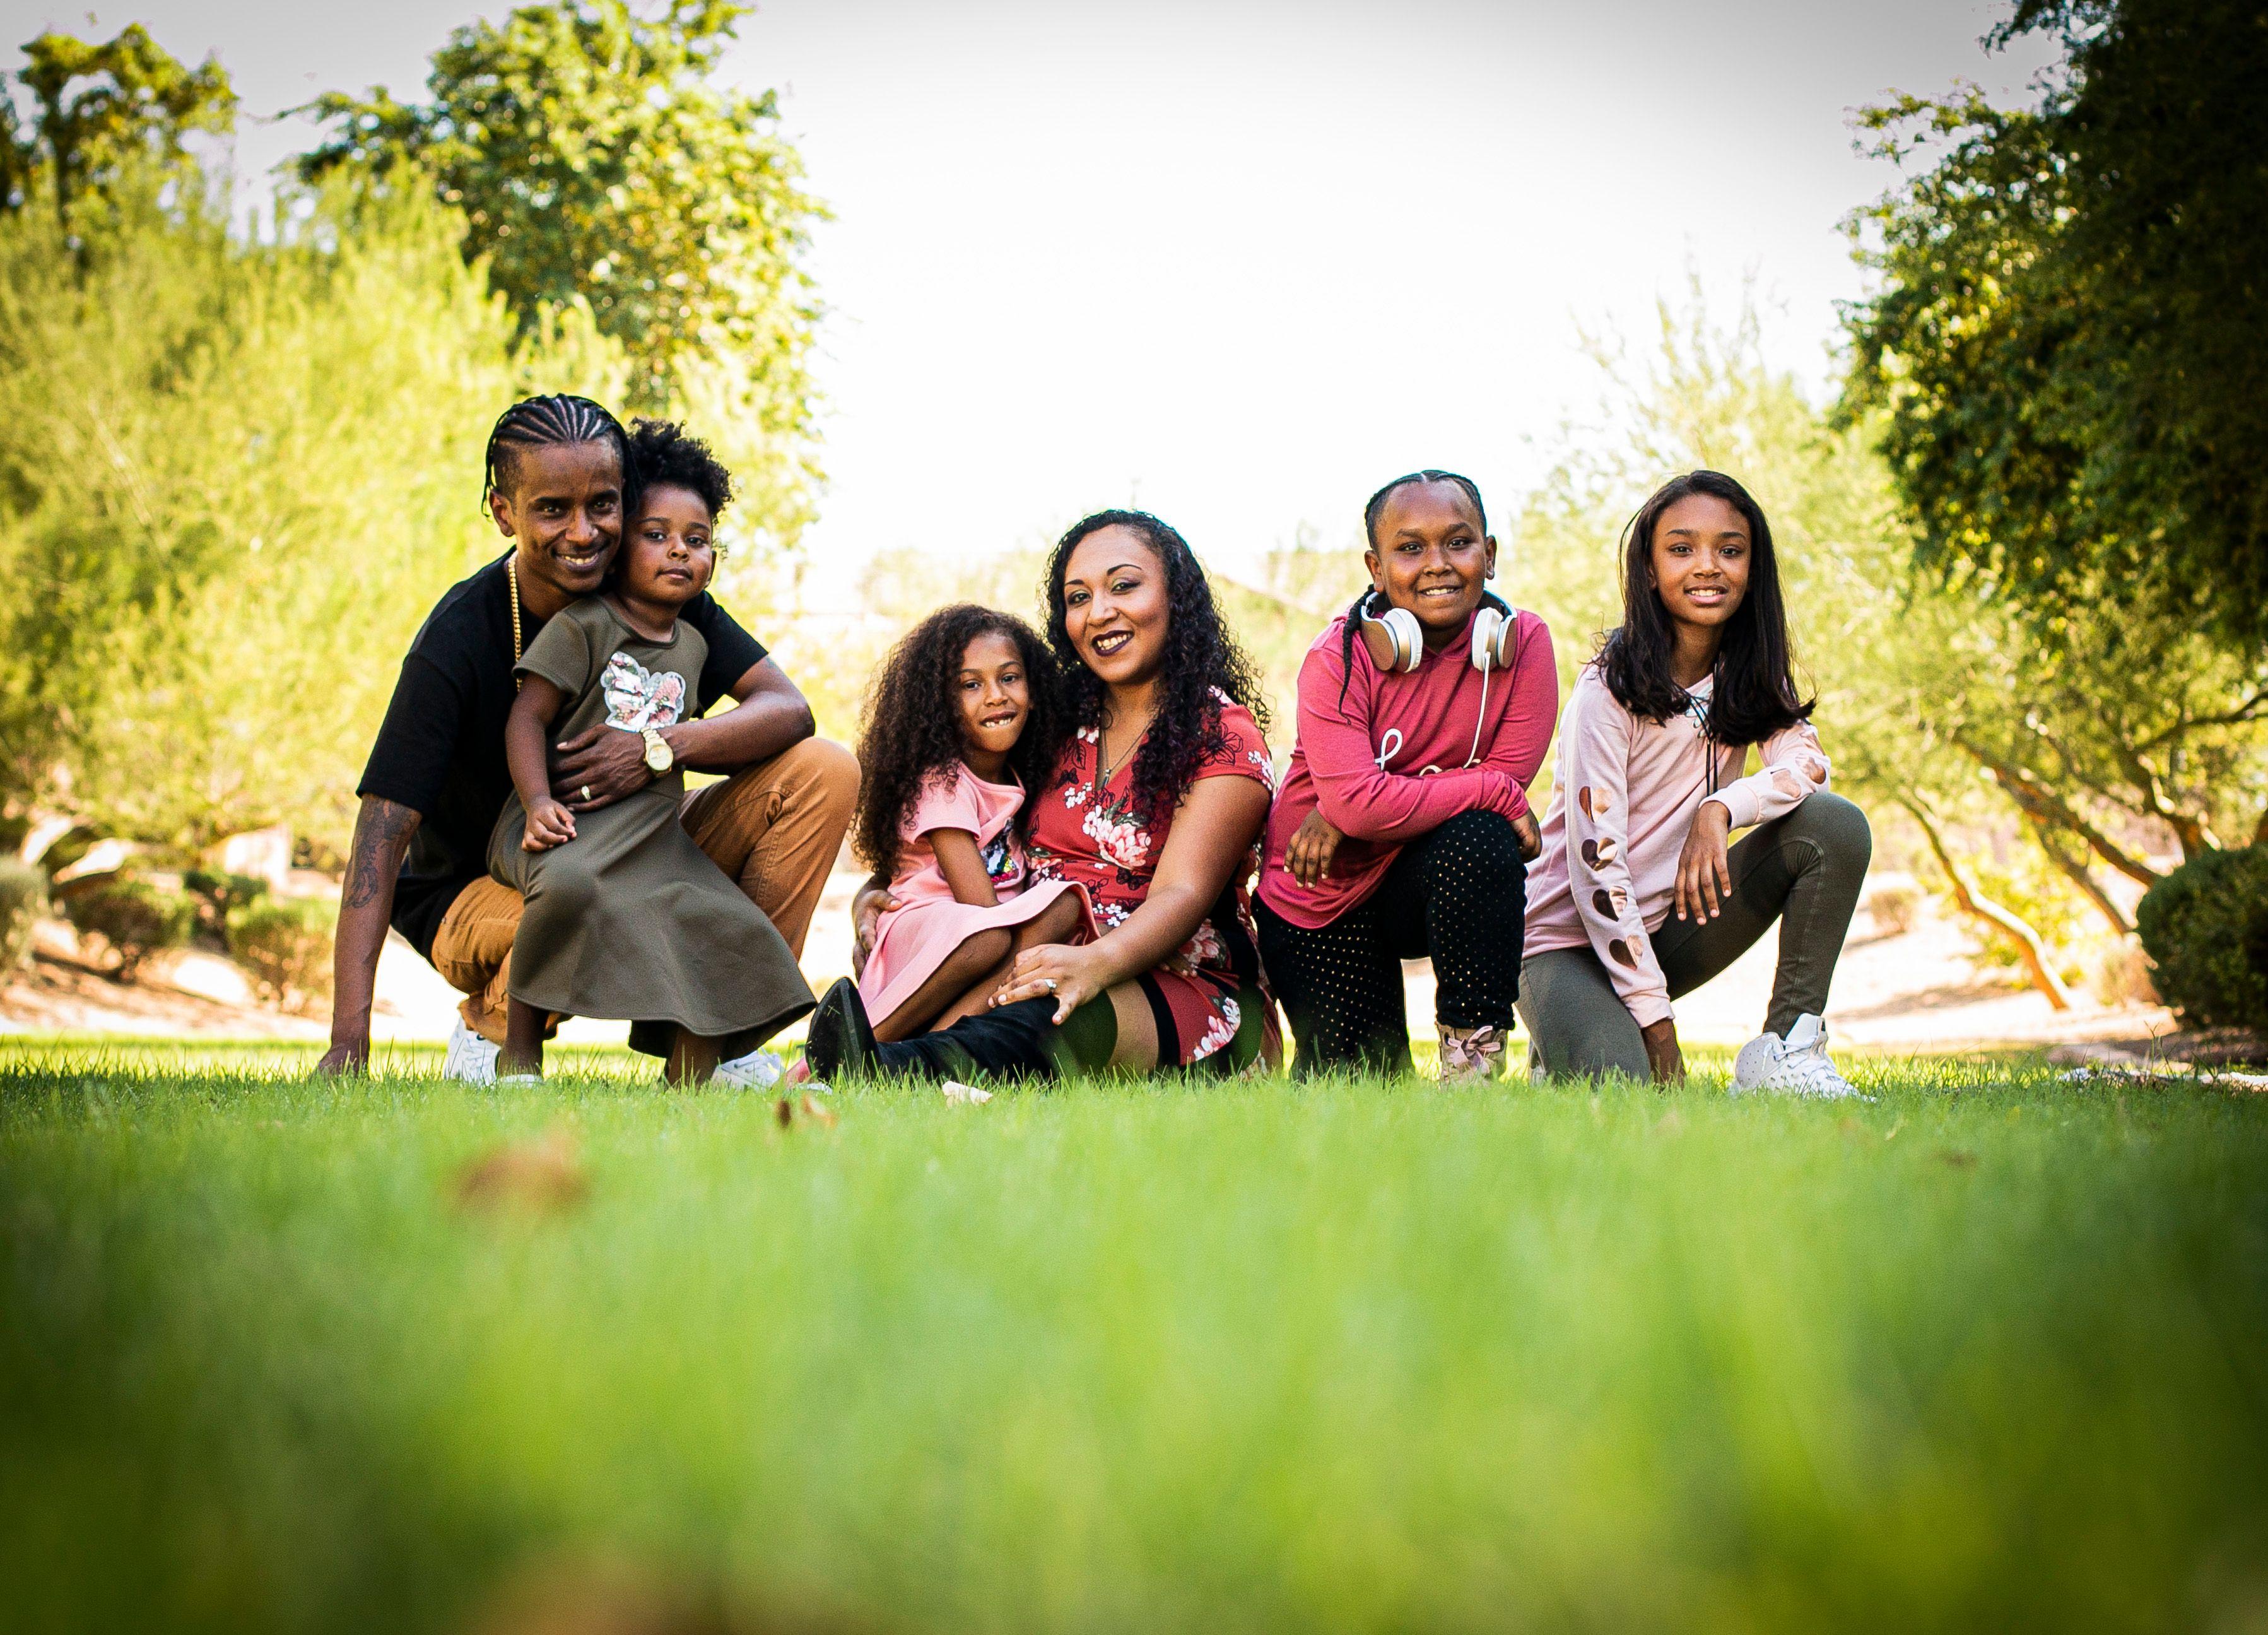 Time Capsule Family Portrait